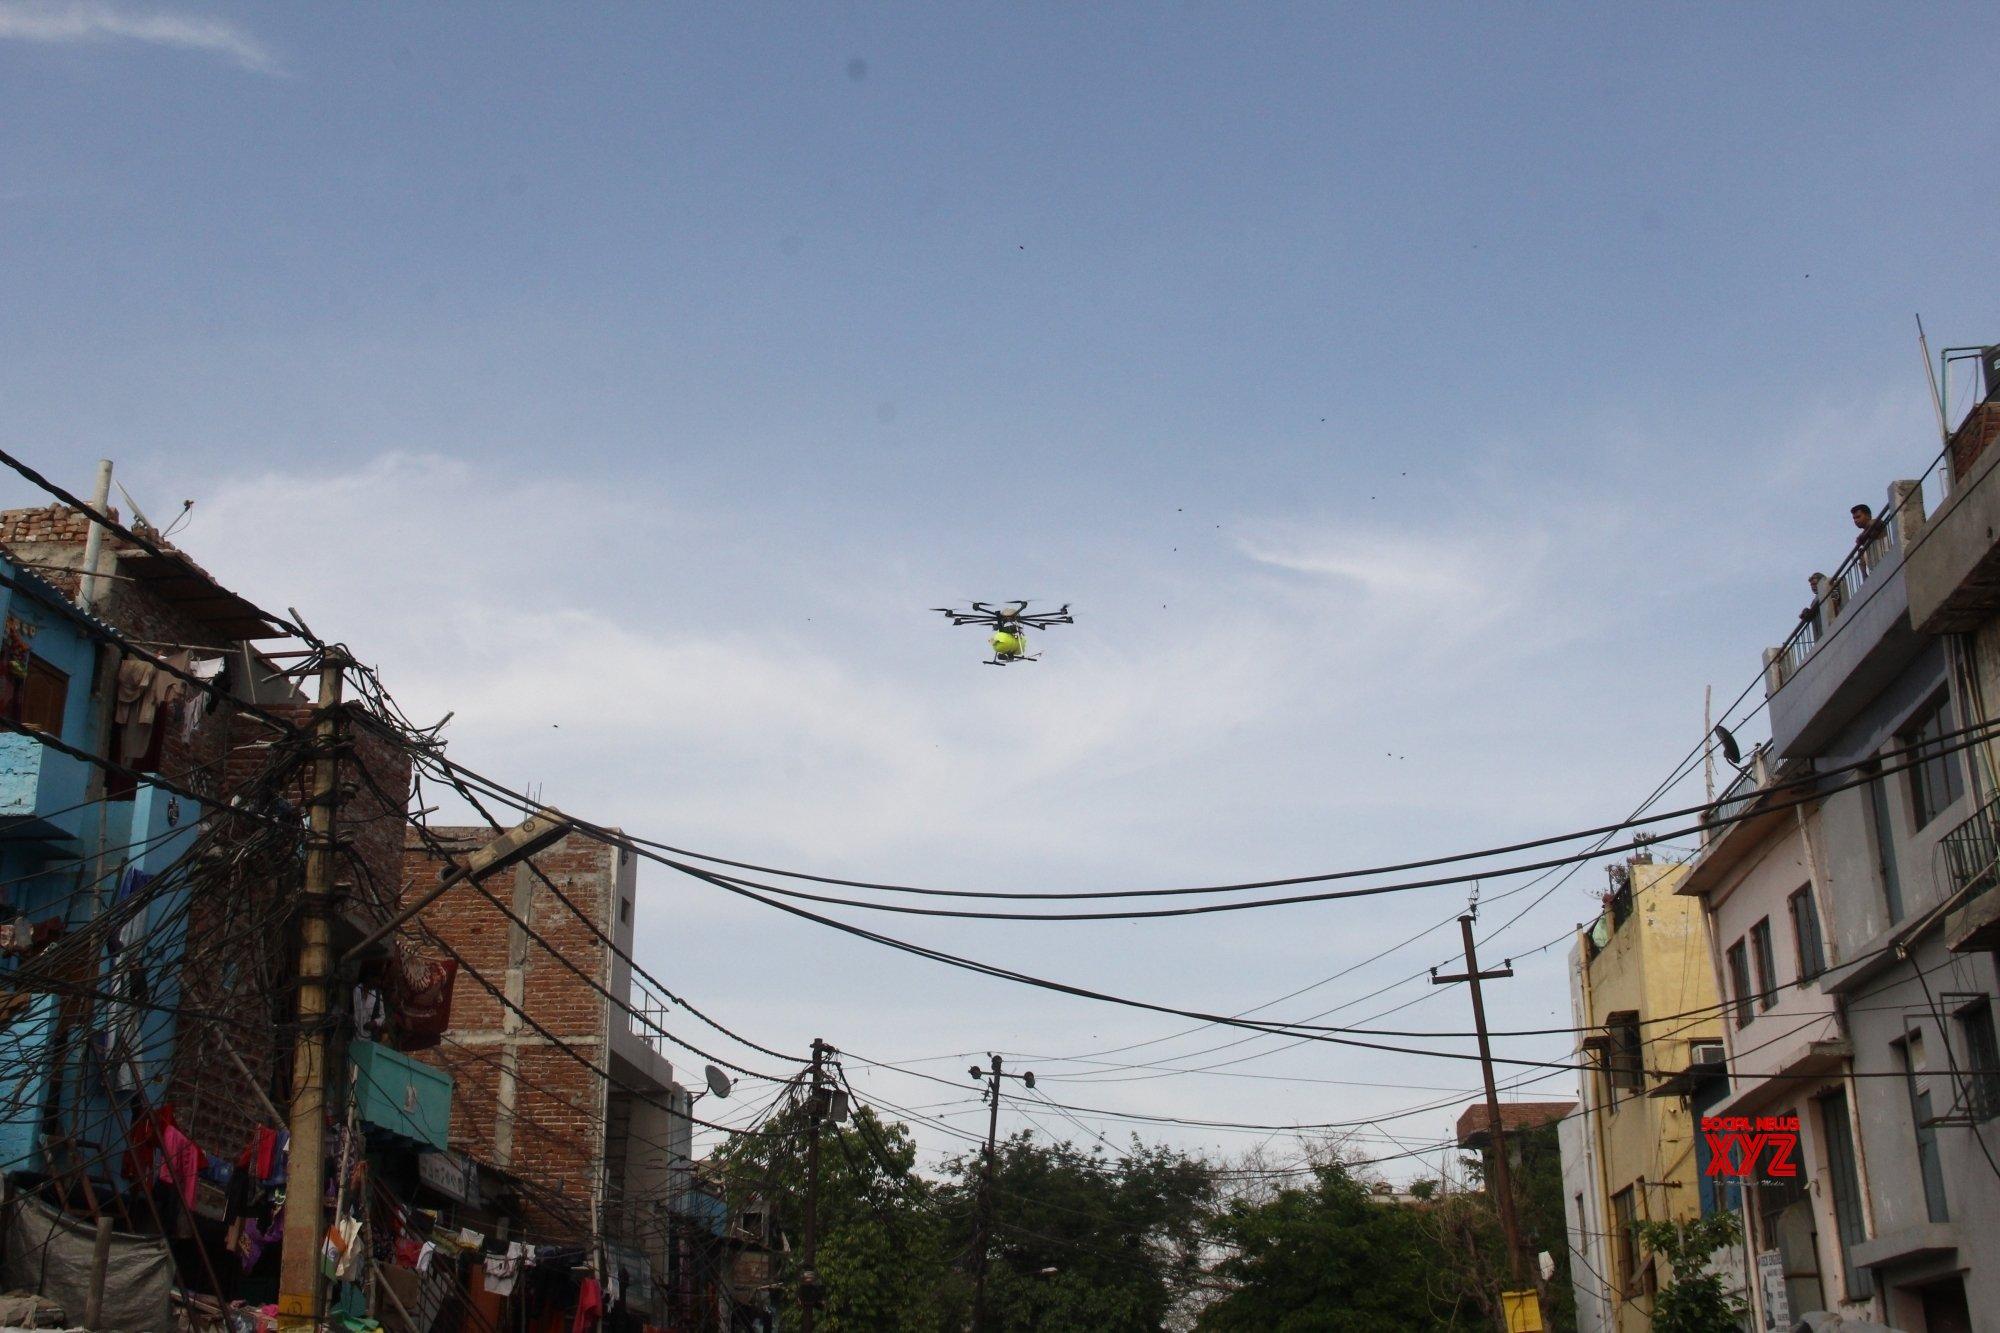 Noida: Drones spray disinfectants in Noida Sector 10 during lockdown #Gallery